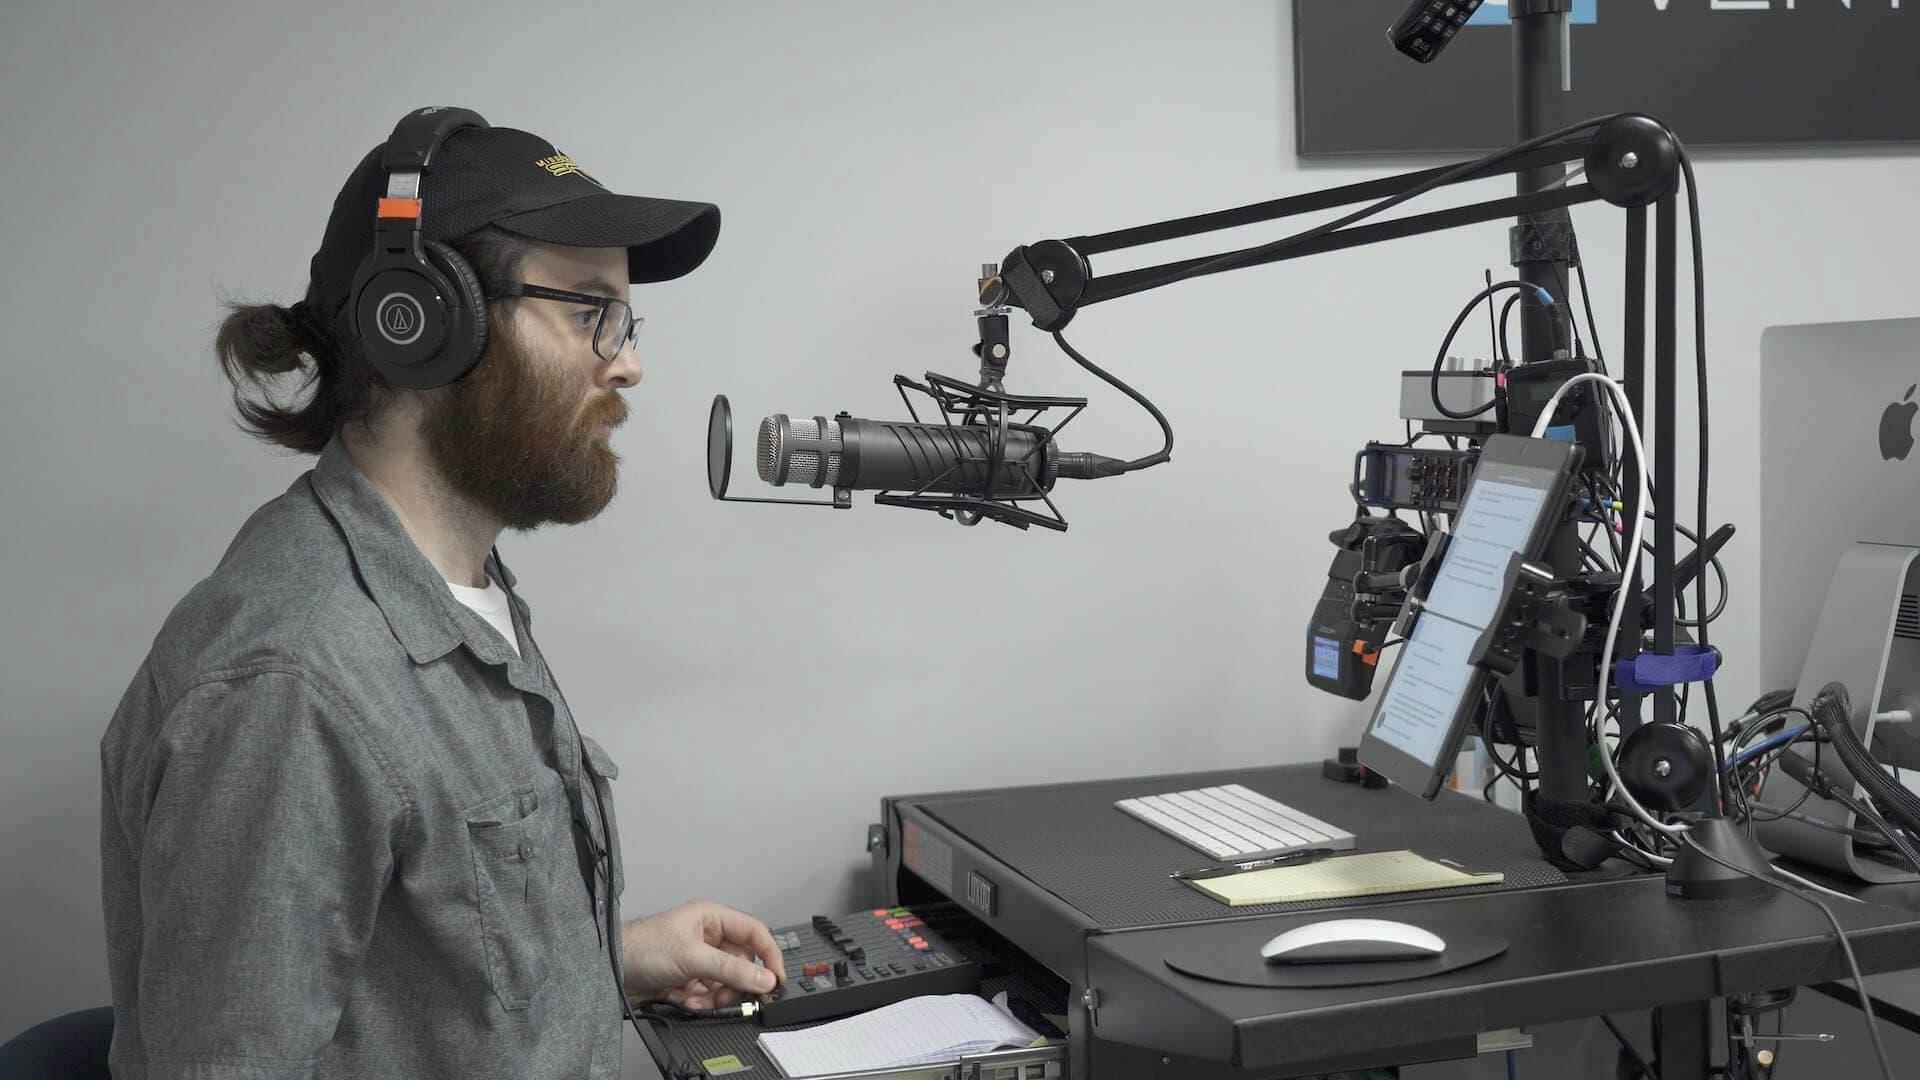 Cybercrime Radio studio space.